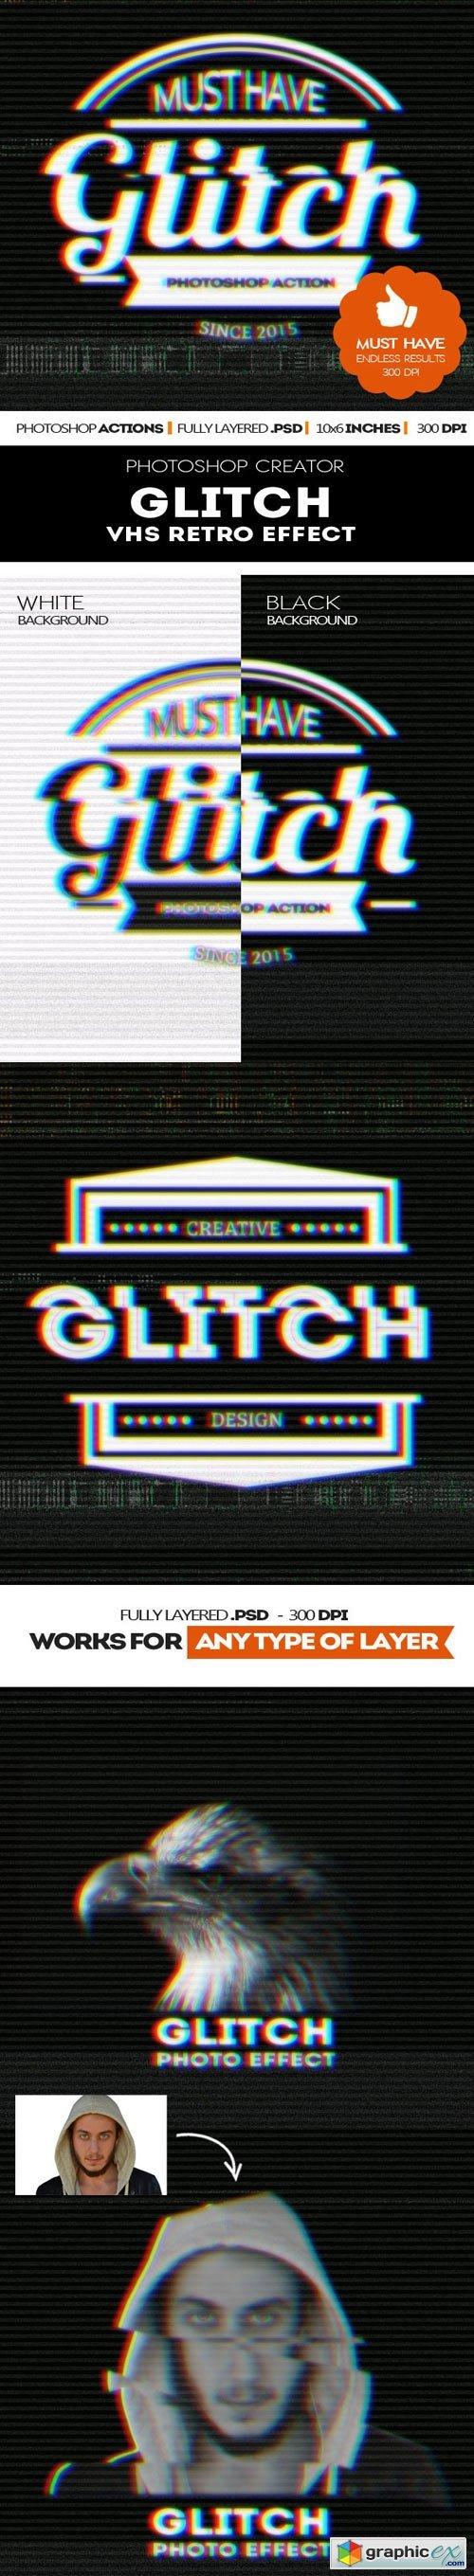 Graphicriver - Glitch VHS Corrupt Image Effect Photoshop